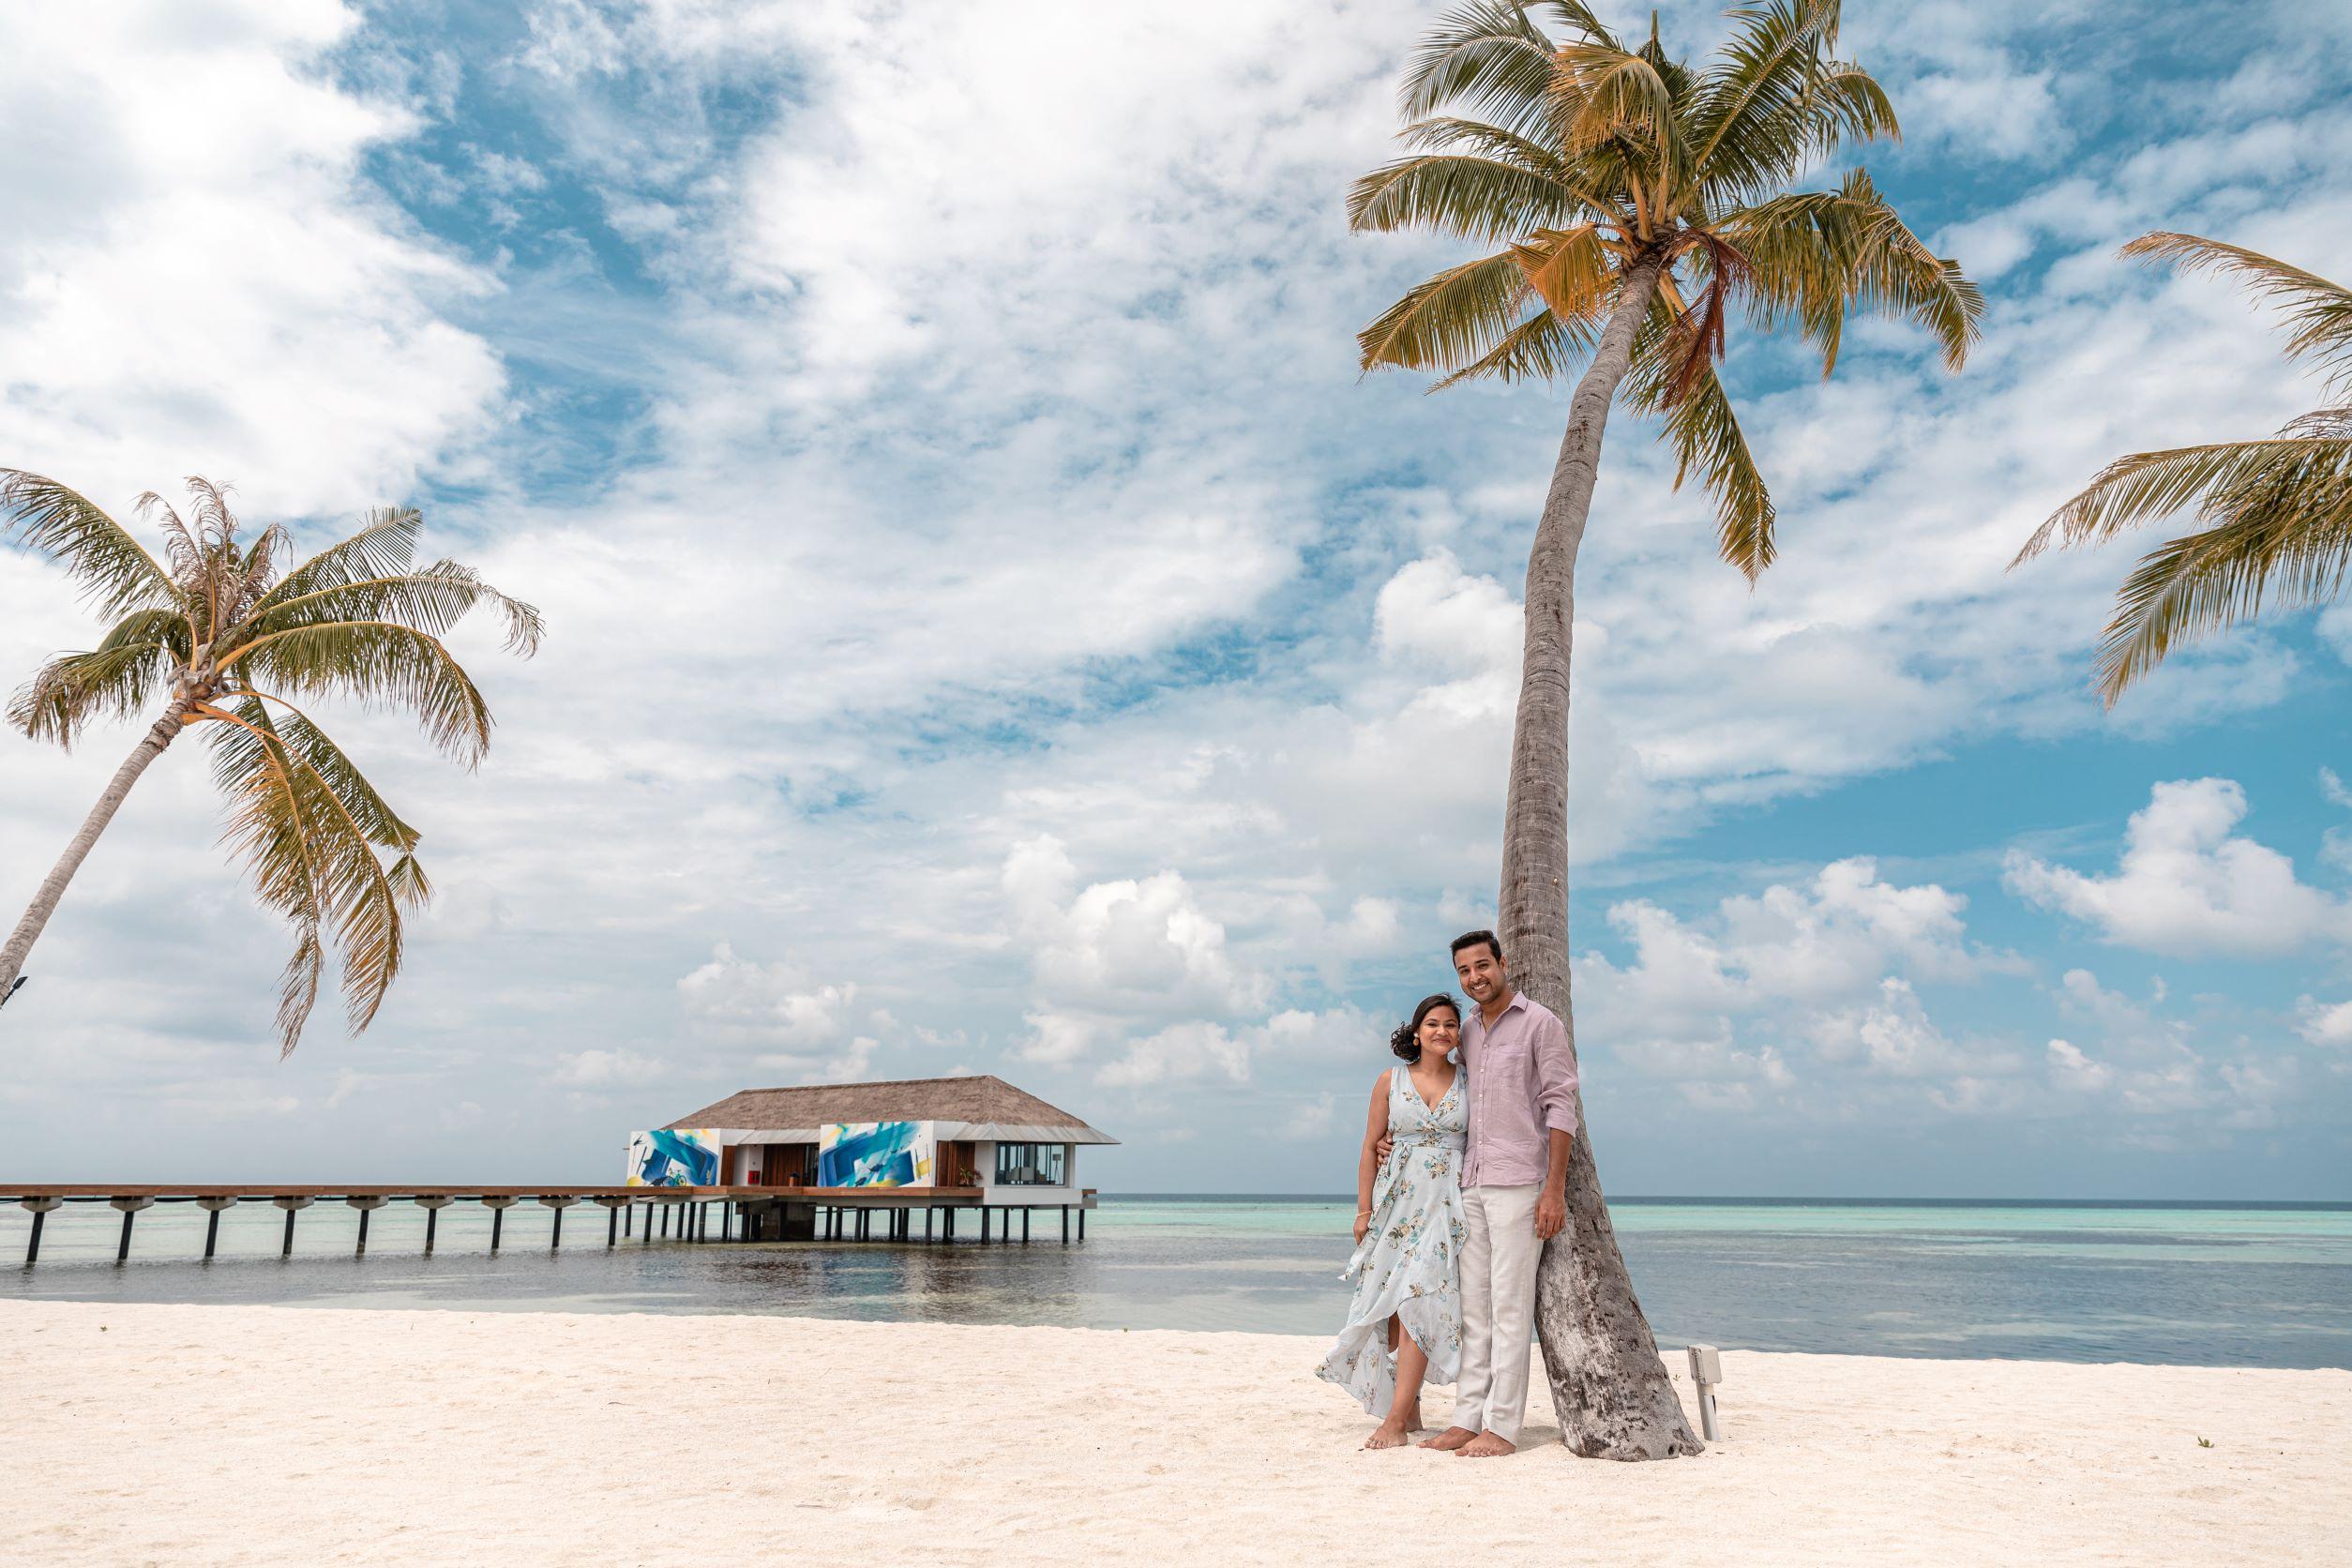 pre wedding shoot on the beach of maldives